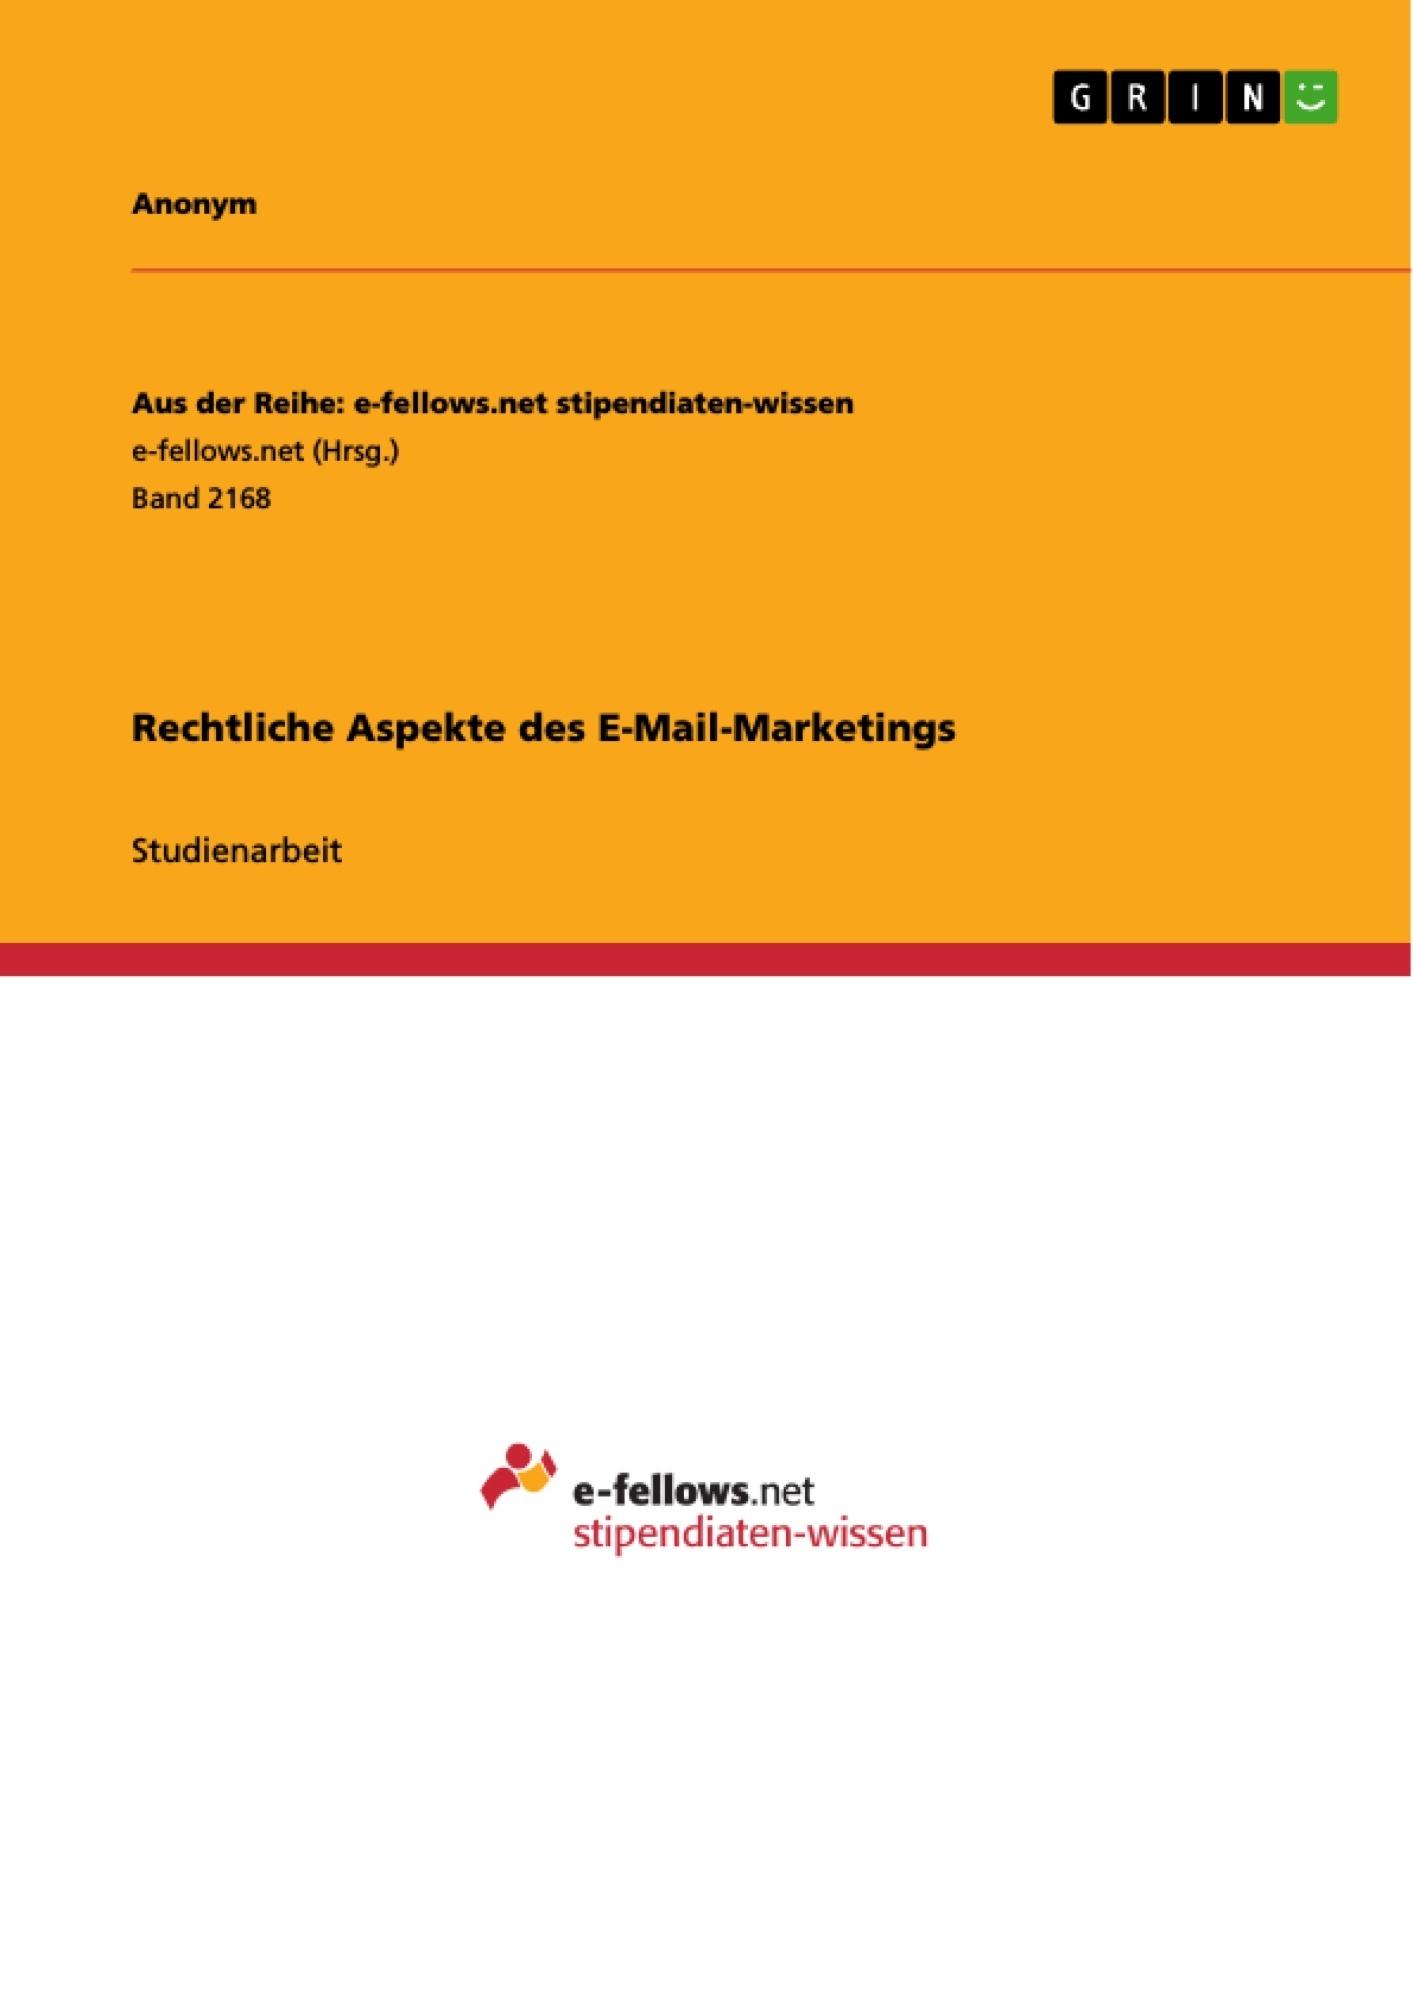 Titel: Rechtliche Aspekte des E-Mail-Marketings